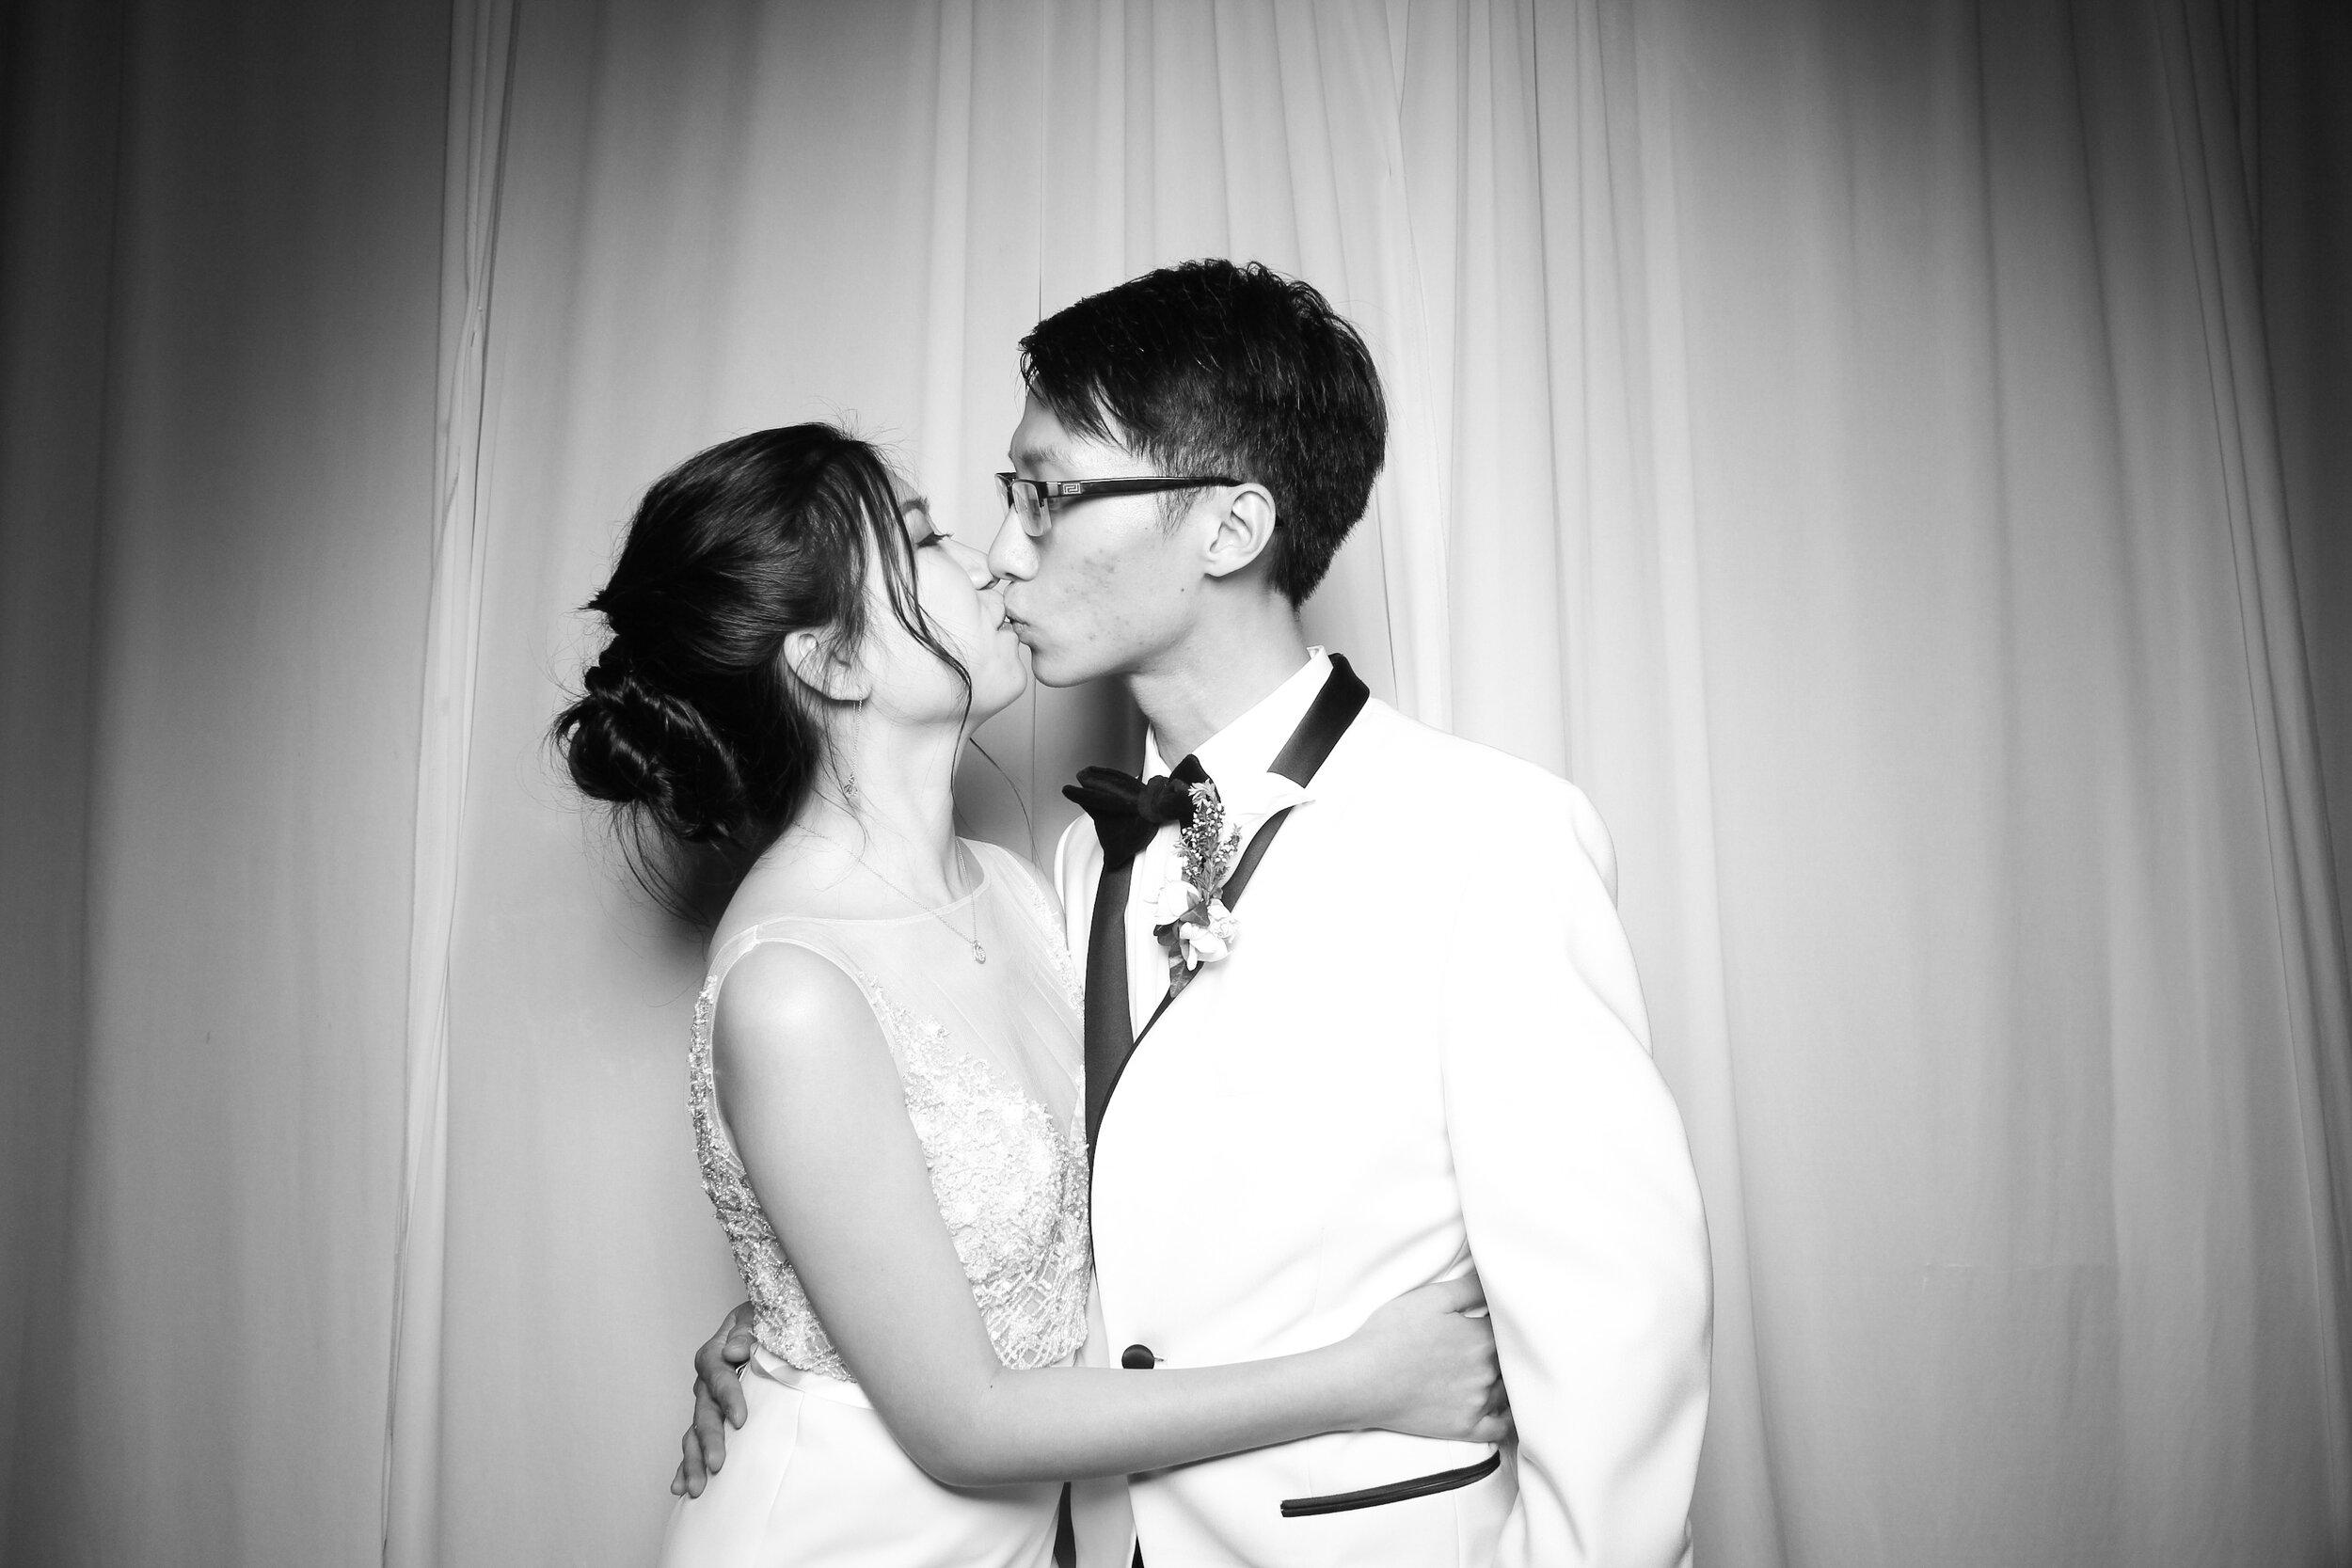 Cai_Restaurant_Chinatown_Chicago_Wedding_Photo_Booth_02.jpg